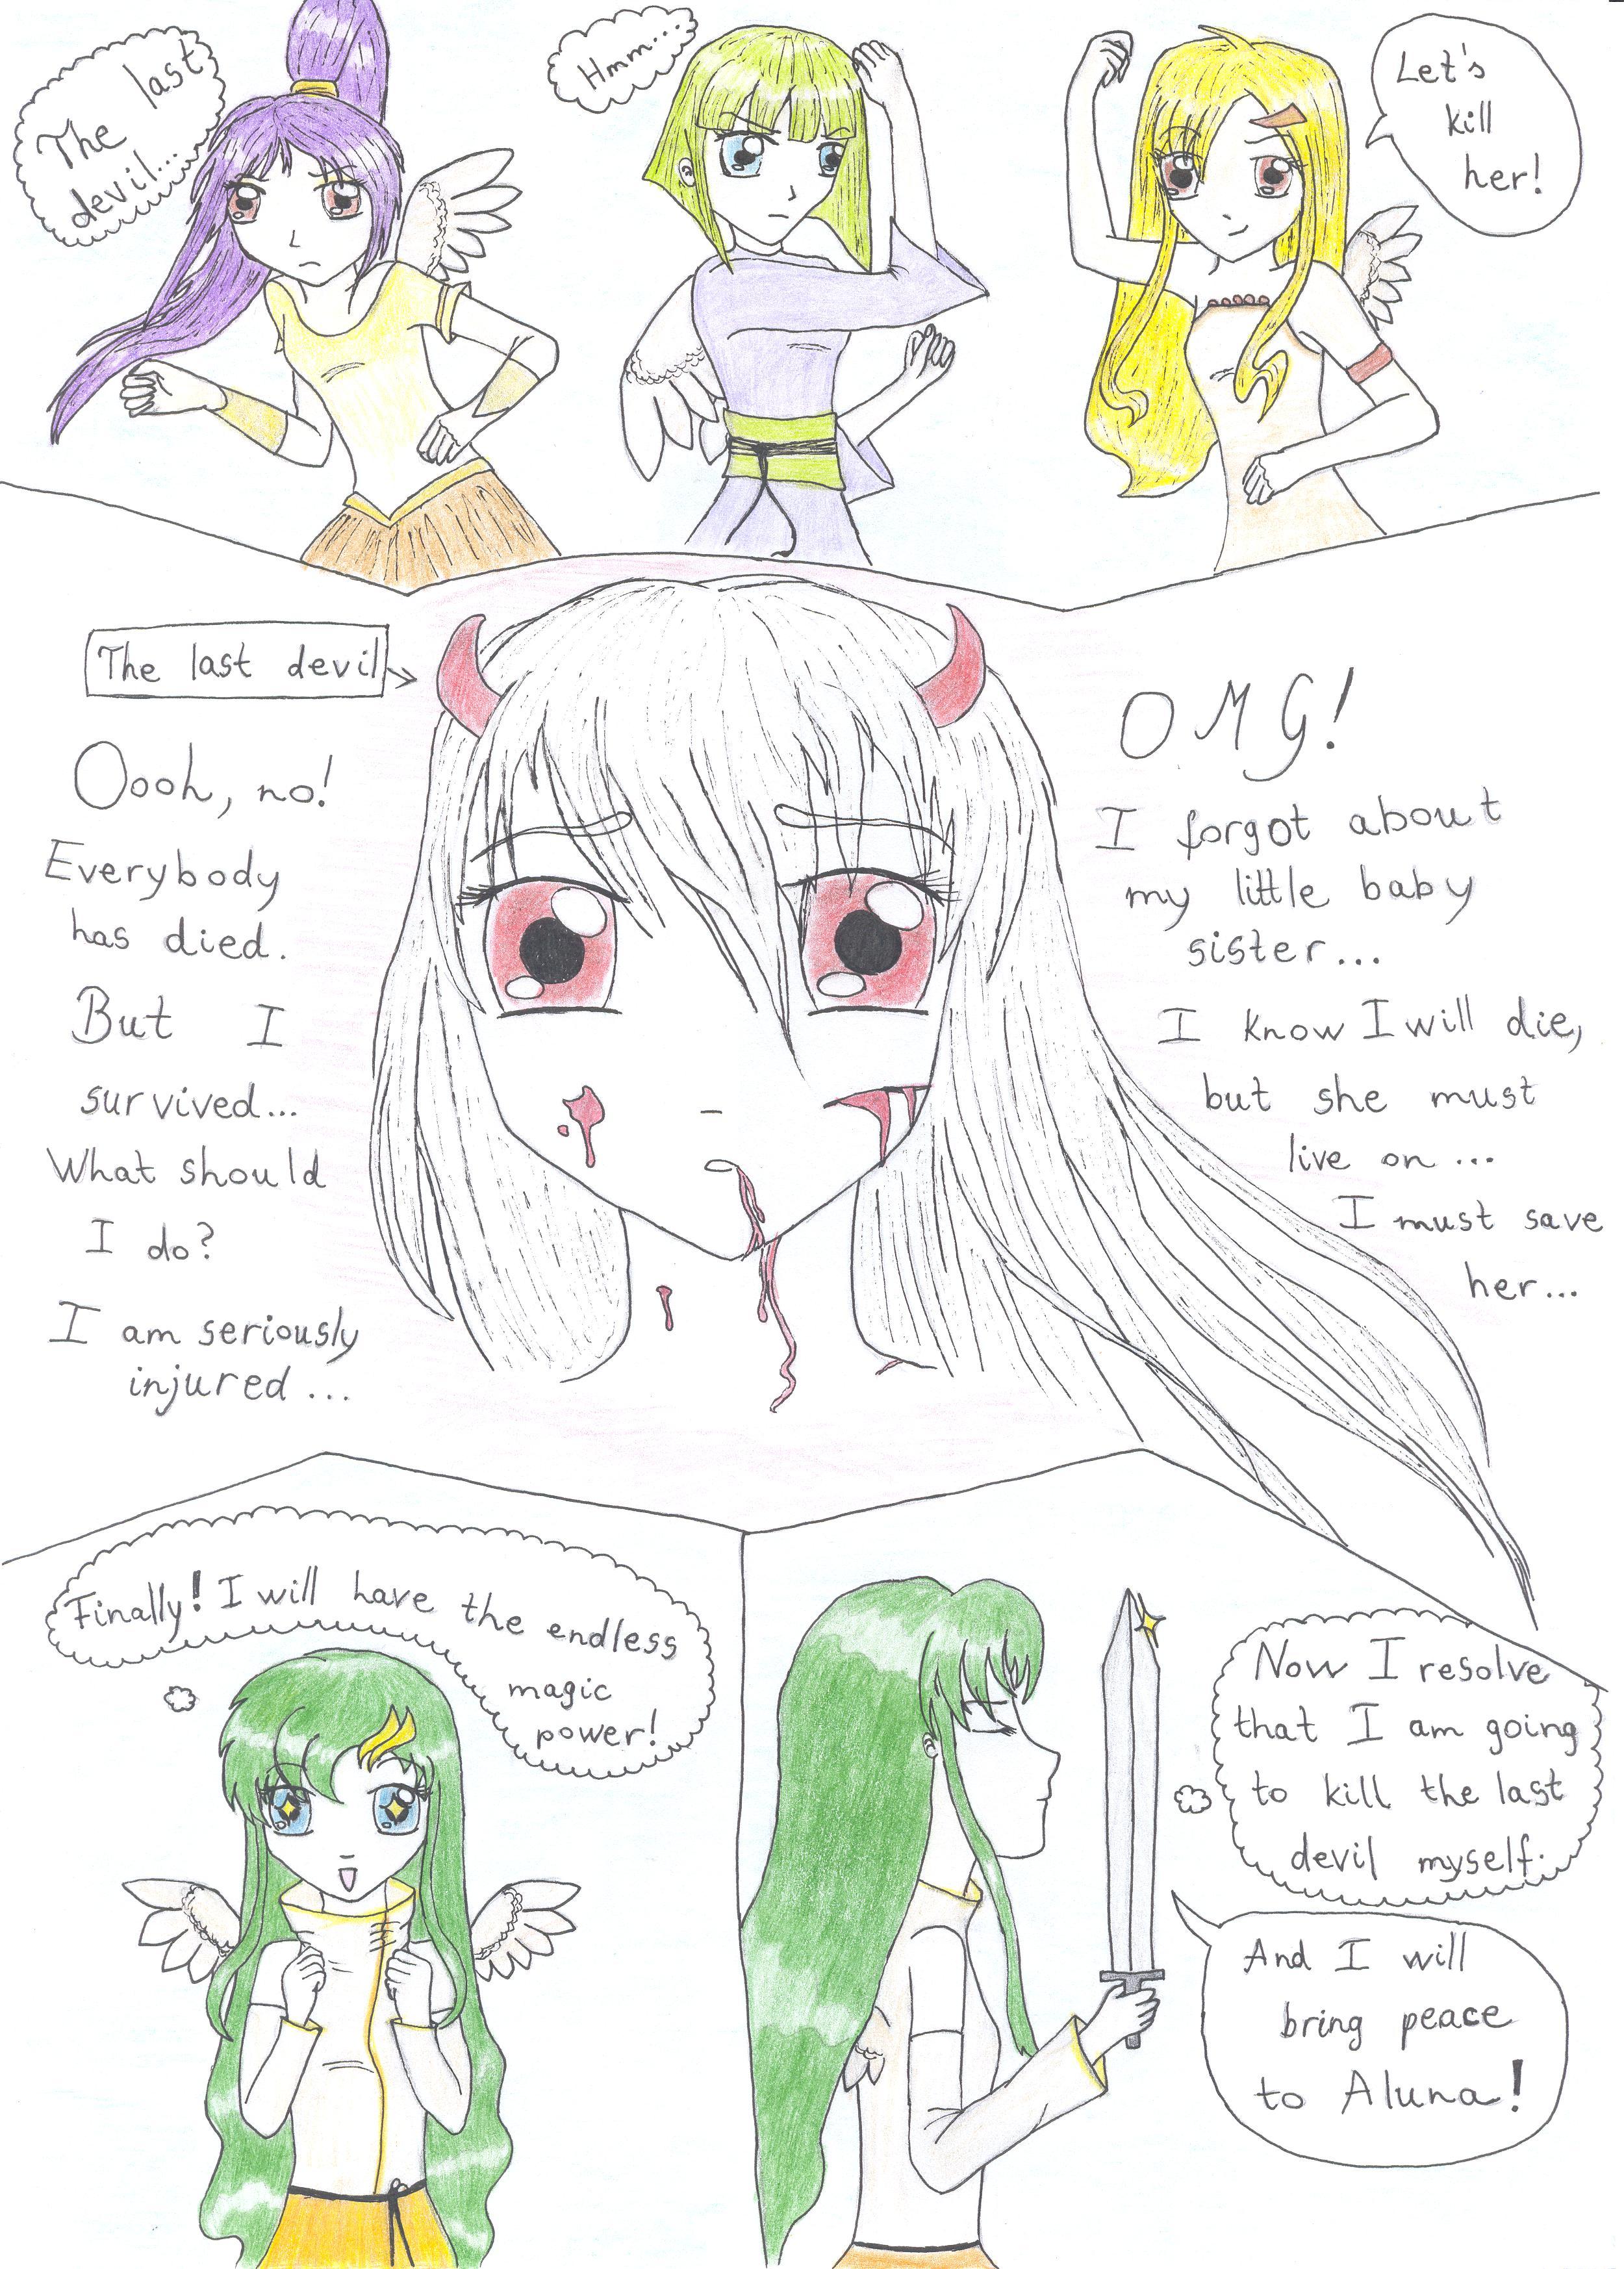 Angel vs devil 3 by Glooriah on DeviantArt